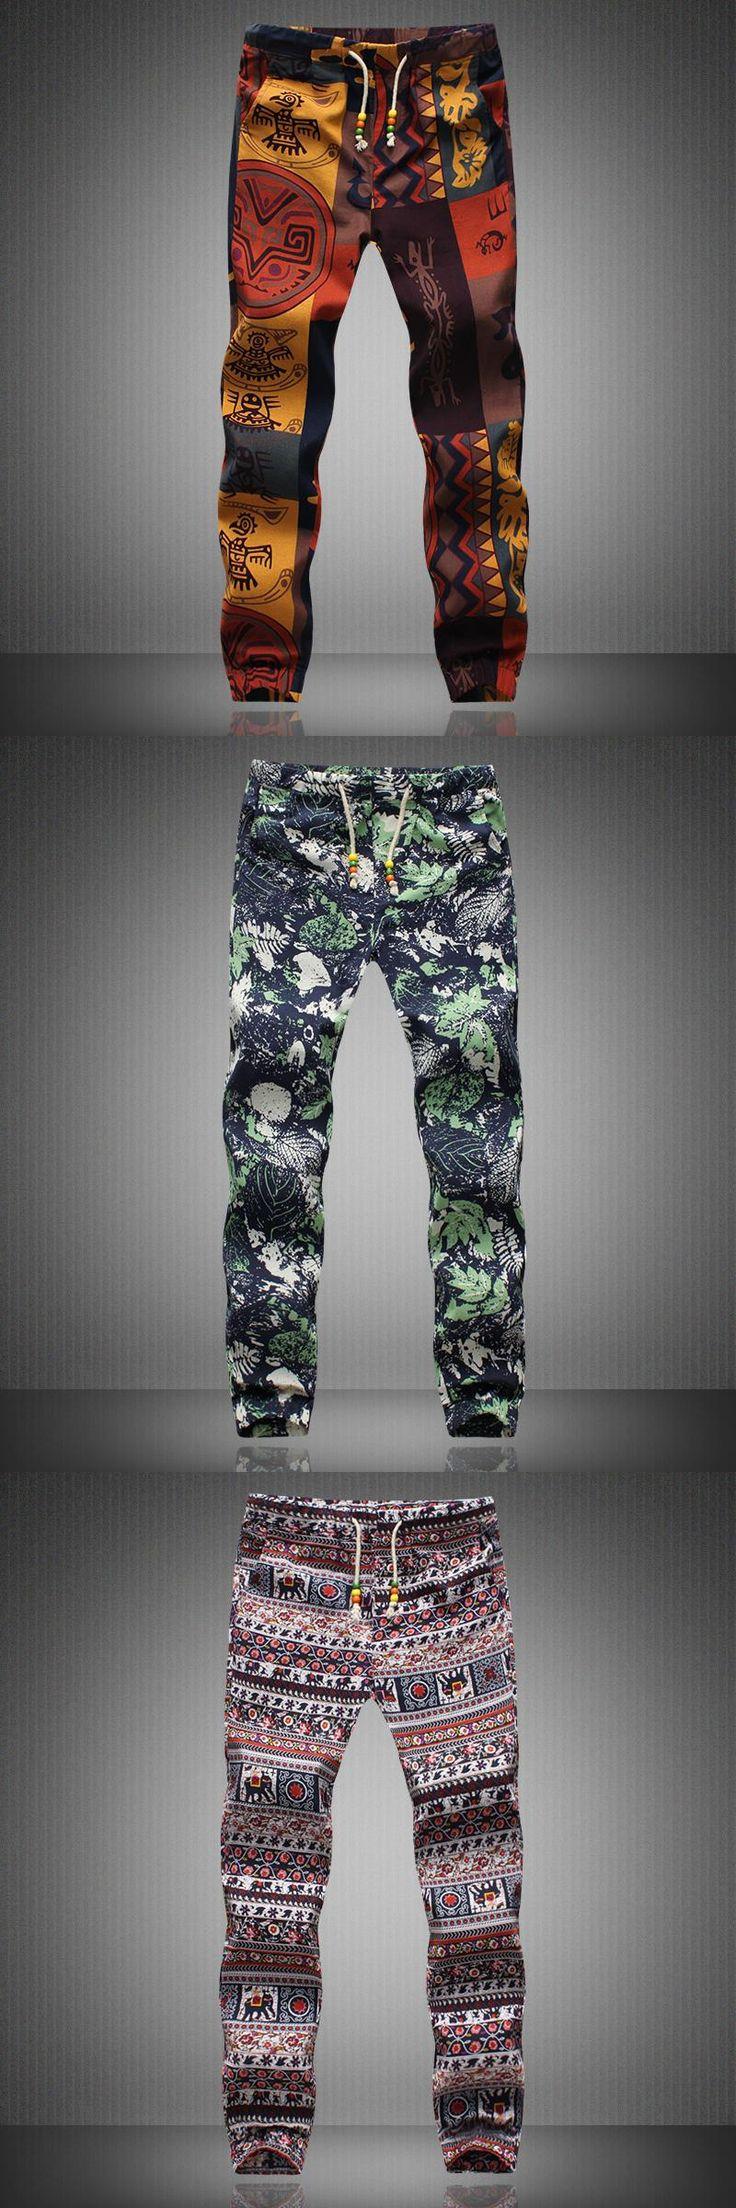 Mens Joggers 2017 Brand Male Trousers Men Linen Pants Casual Pants Sweatpants Jogger CHOLYL CHOLYL